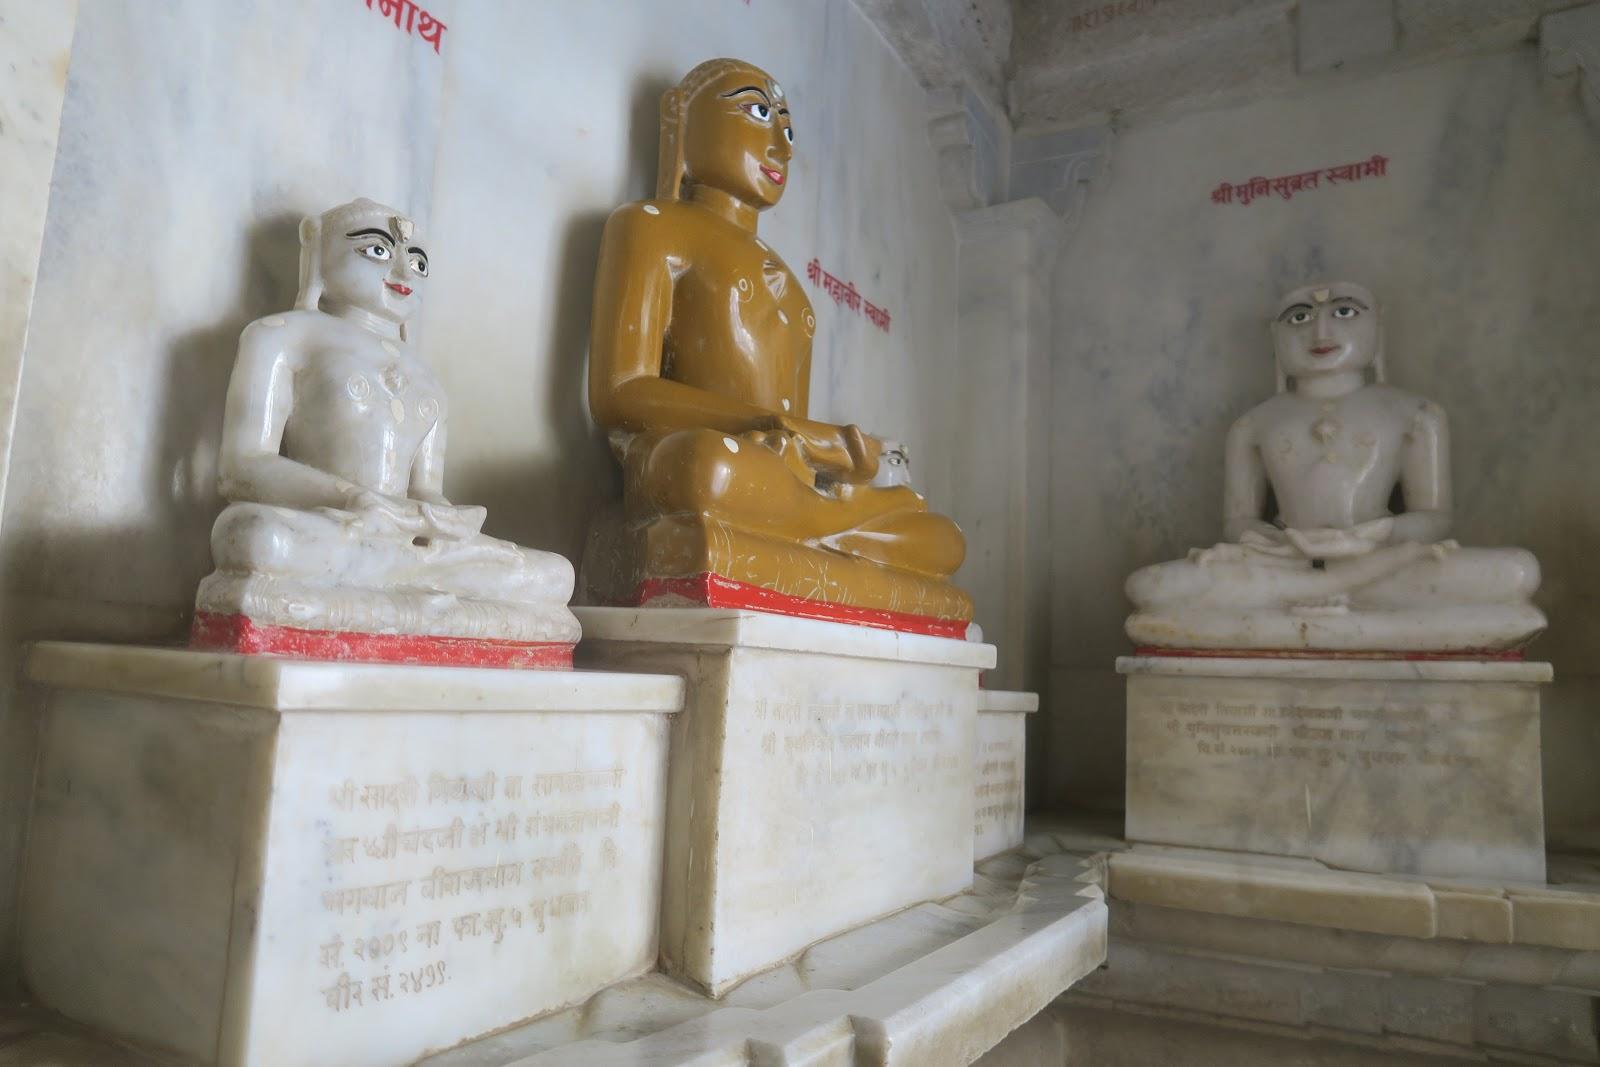 Famous Place to Visit in Ranakpur-Narlai,the first Jain Tirthankara